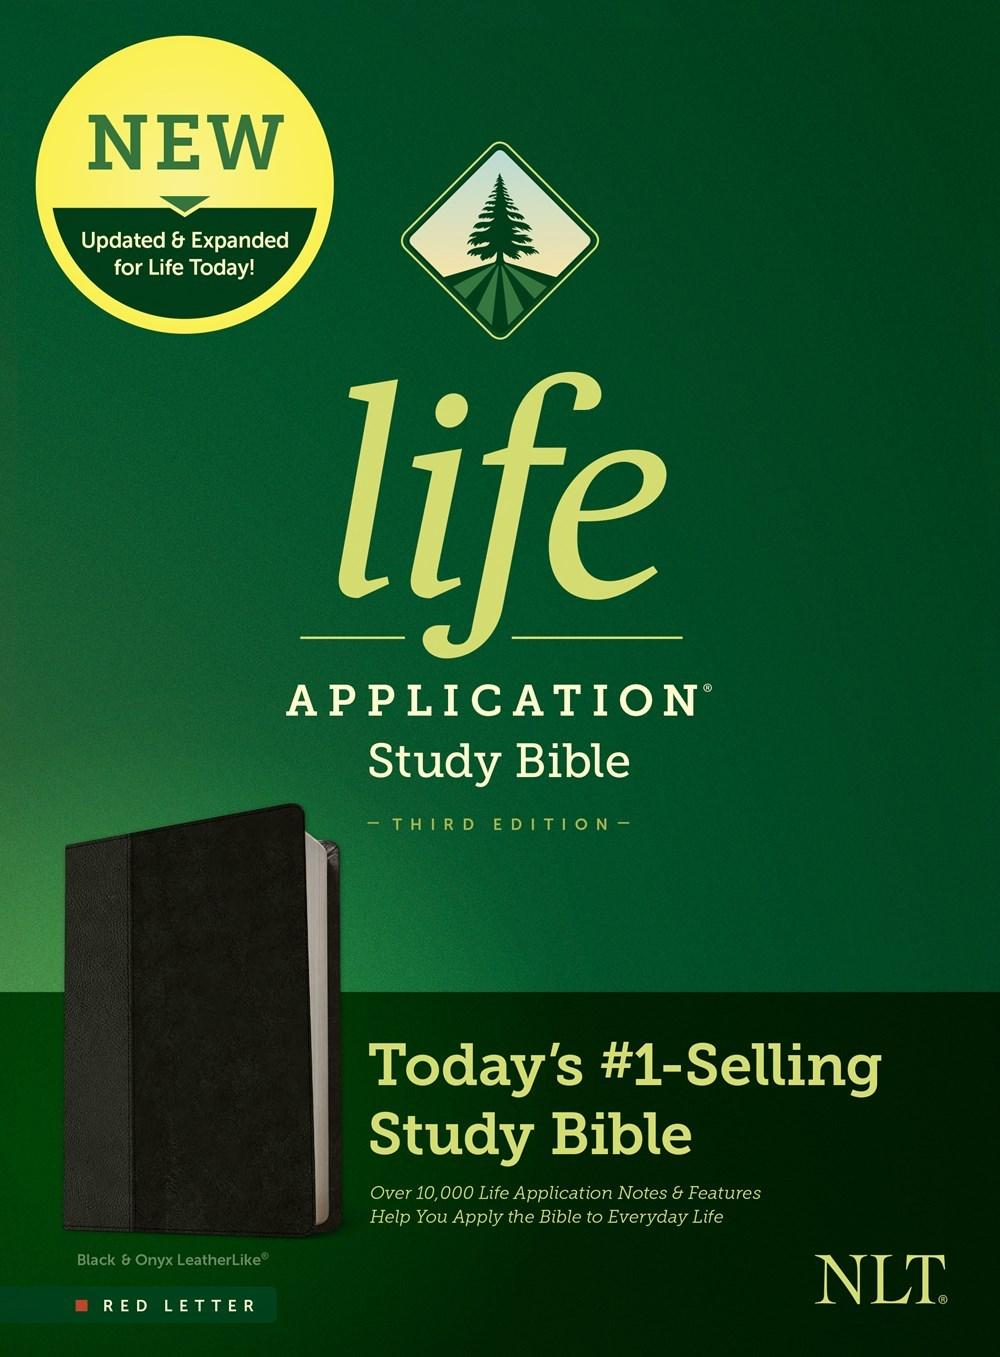 NLT Life Application Study Bible (Third Edition)-RL-Black/Onyx LeatherLike